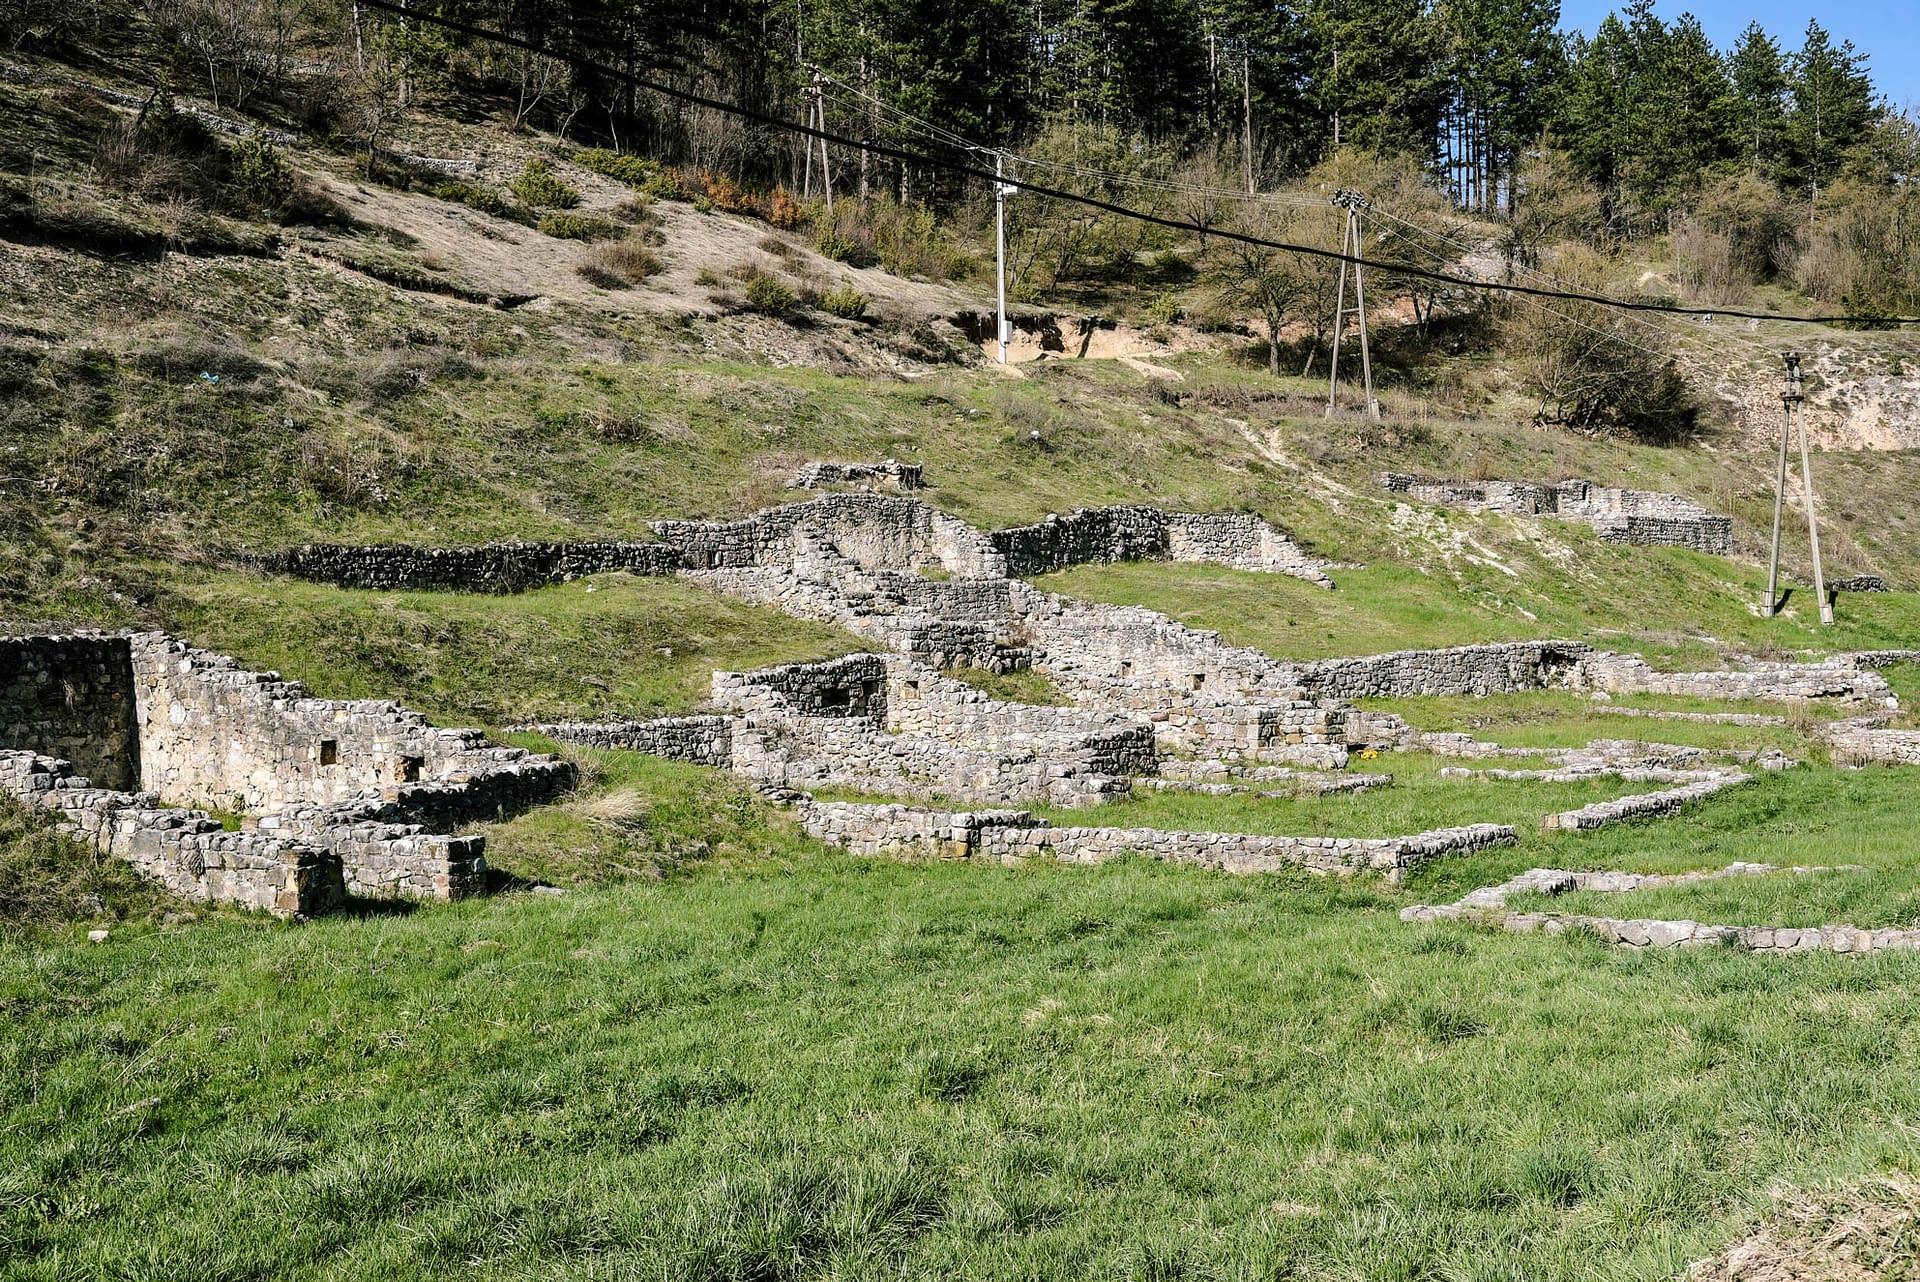 Stari grad Ras